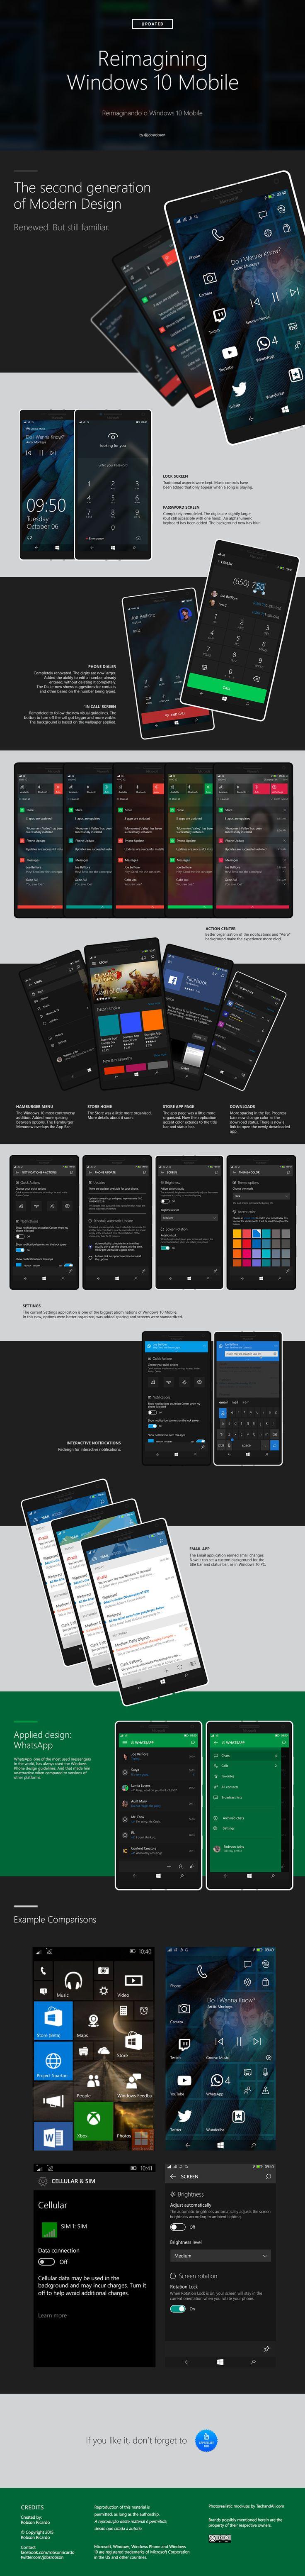 Reimagining Windows 10 Mobile [Update 2] on Behance